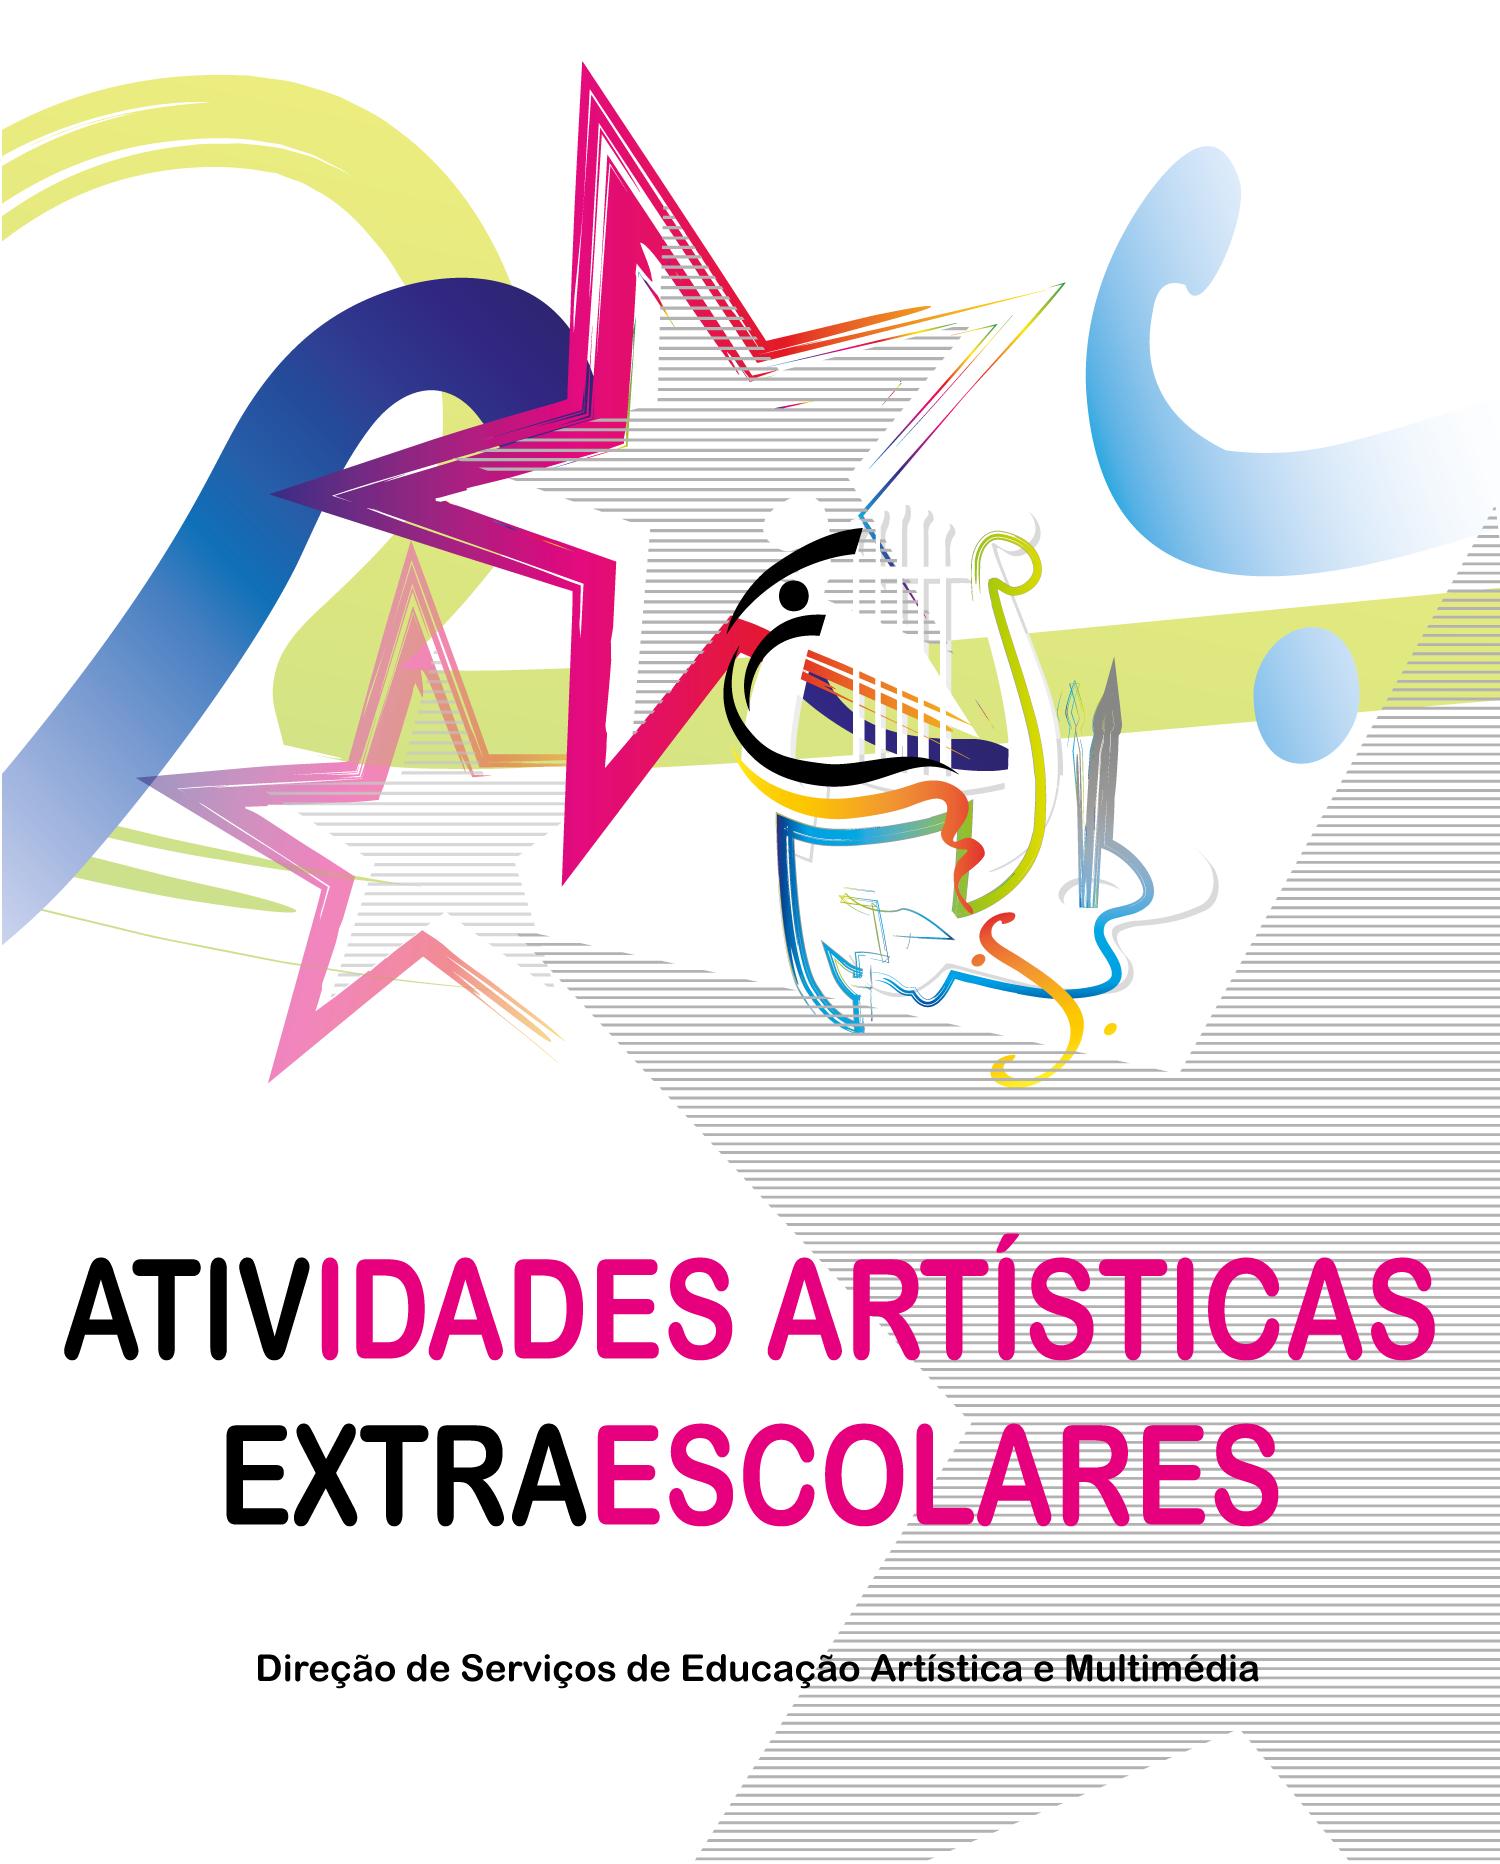 Atividades Artísticas Extraescolares